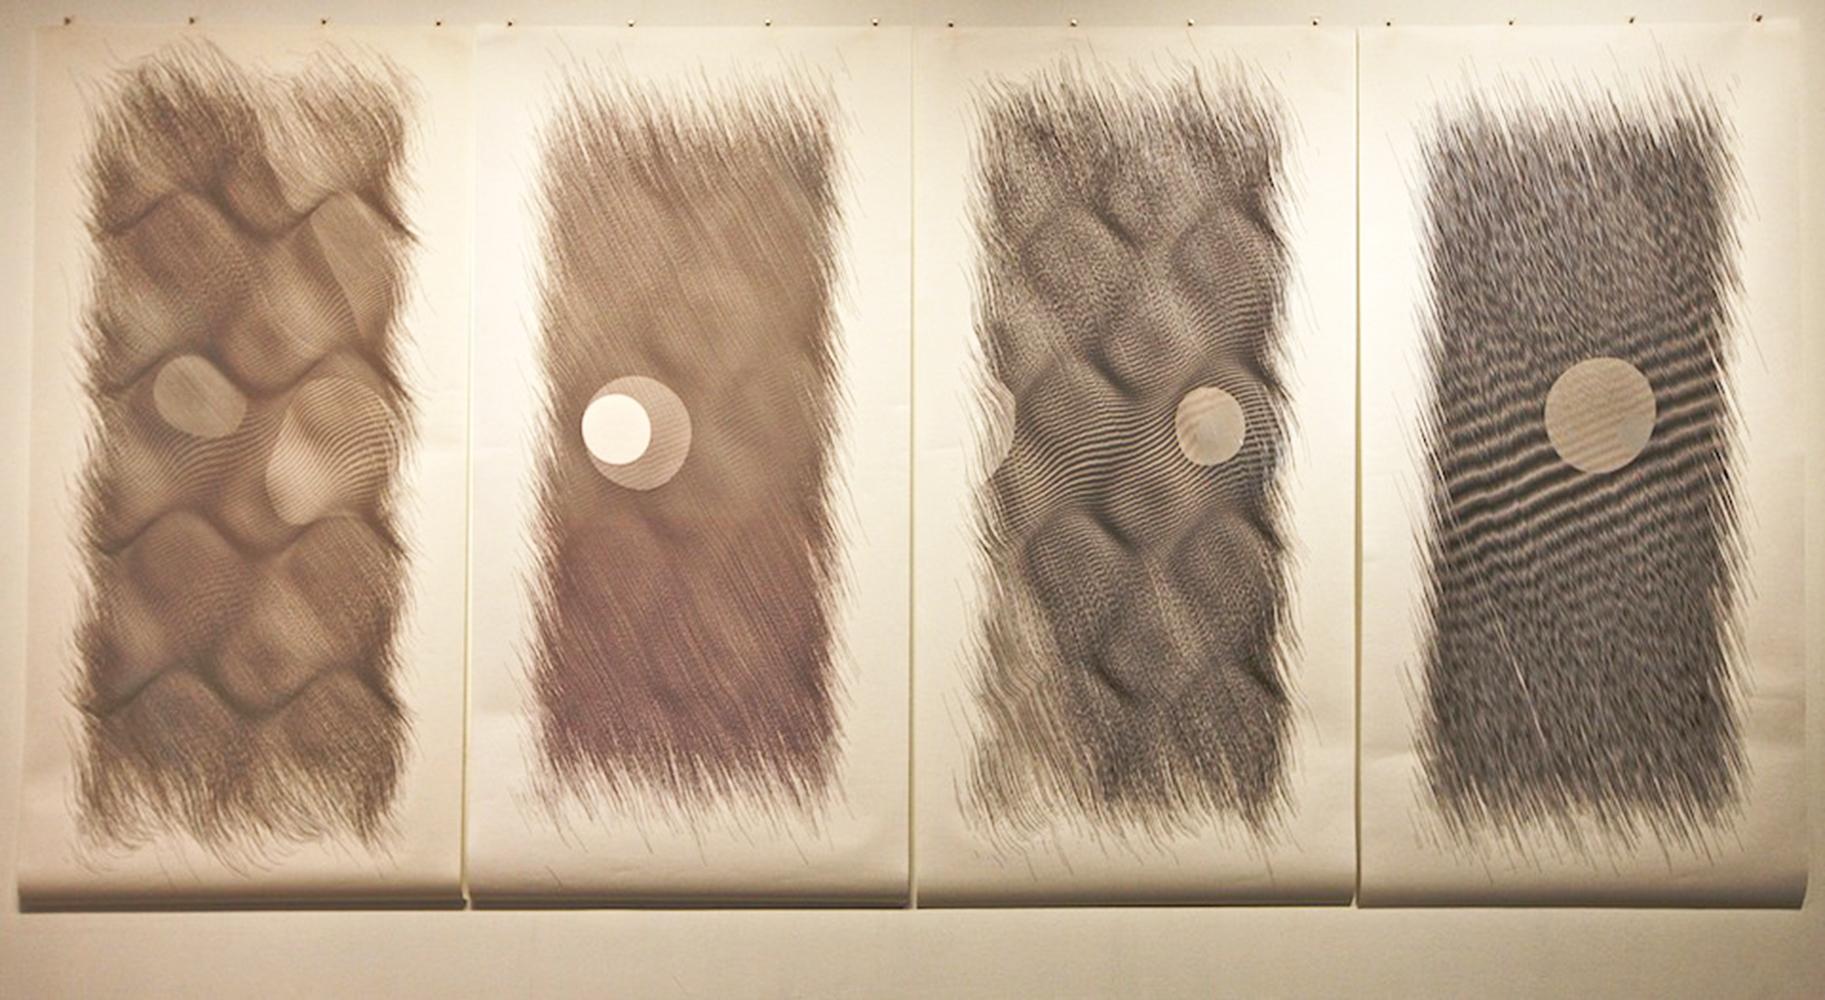 "Wavelets    Ink on paper - pen plotter drawing    Art : 76""x152"" total (4 panels 76""x38"" each)    Paper : Torinoko"